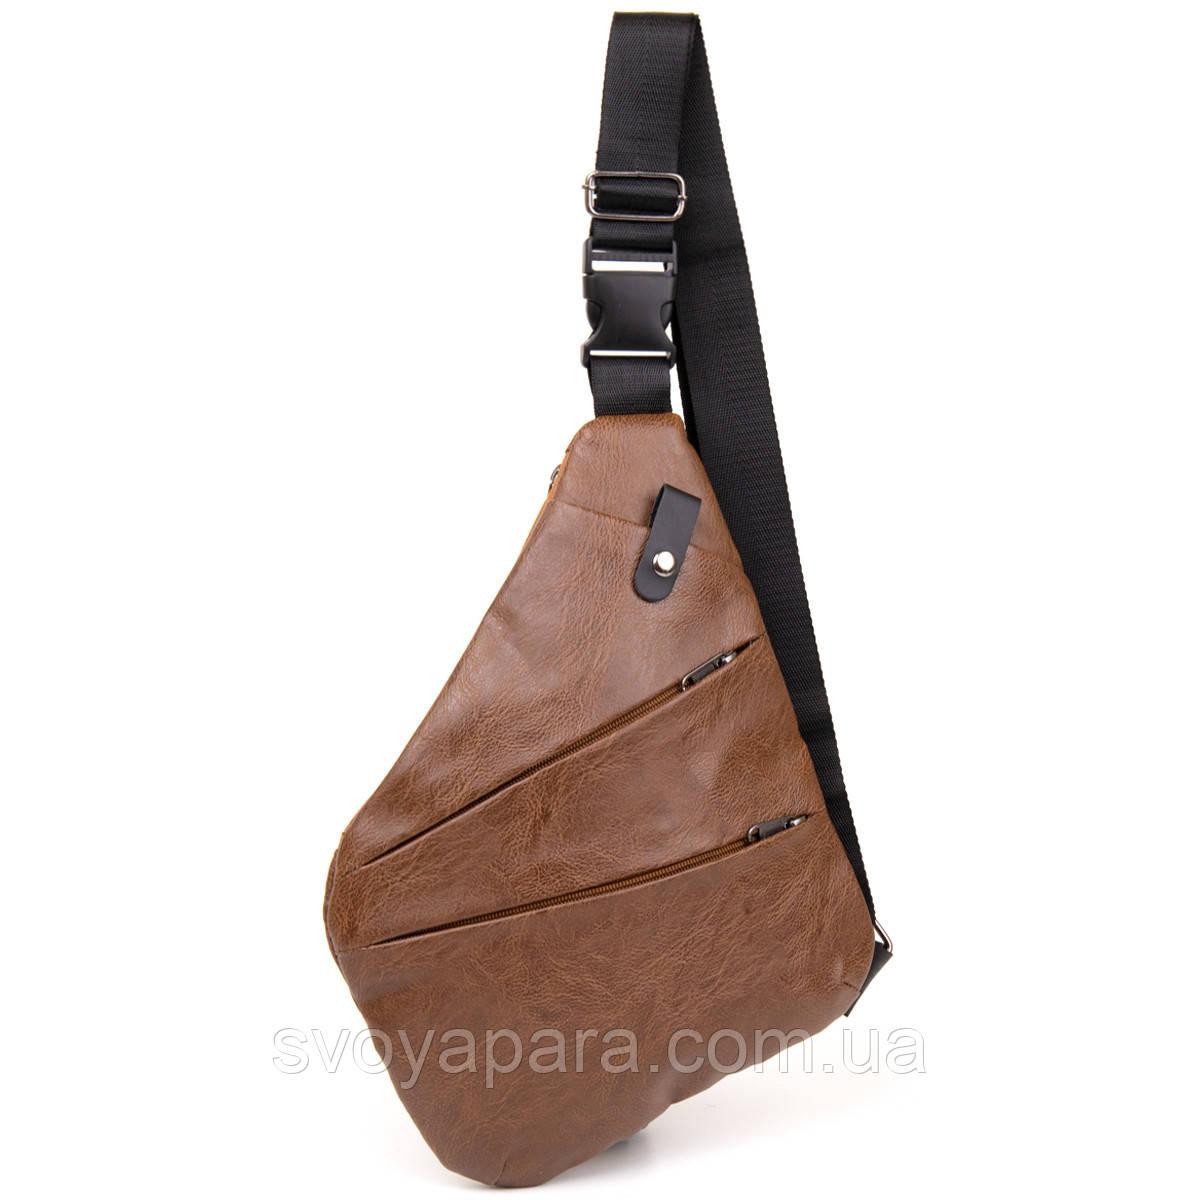 Сумка слинг кожзам Vintage 20567 Светло-коричневая